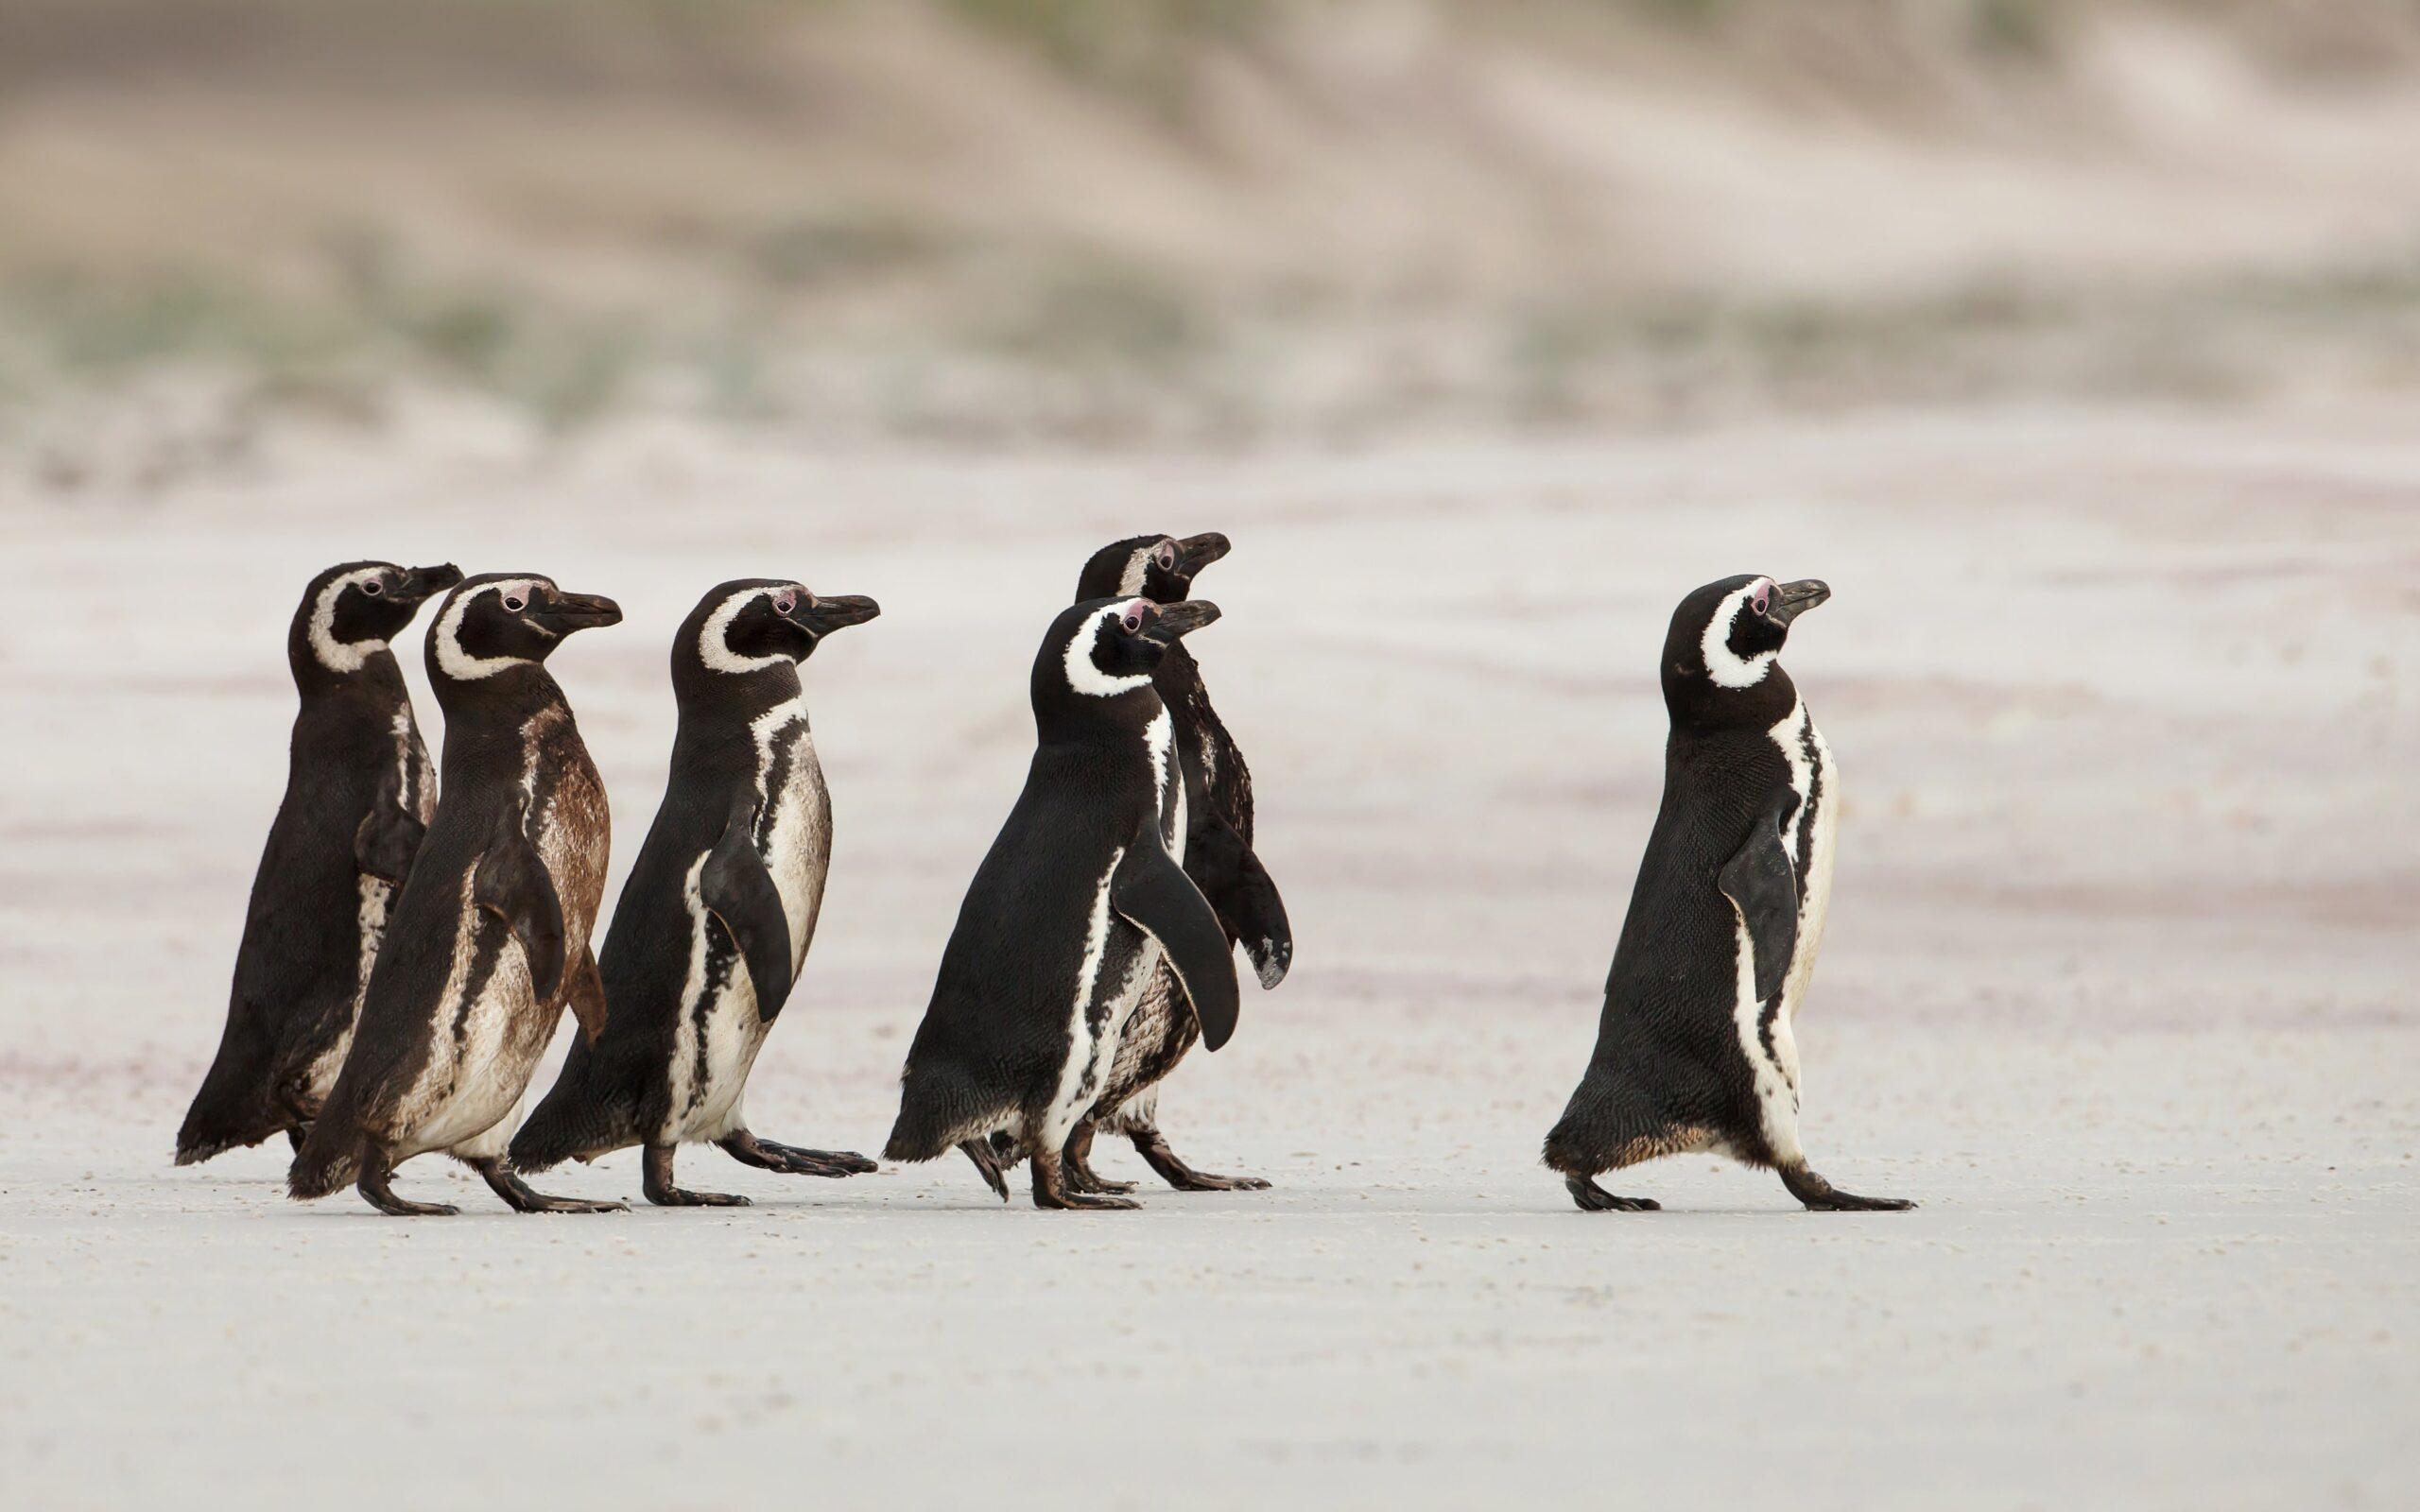 penguins following leader penguin